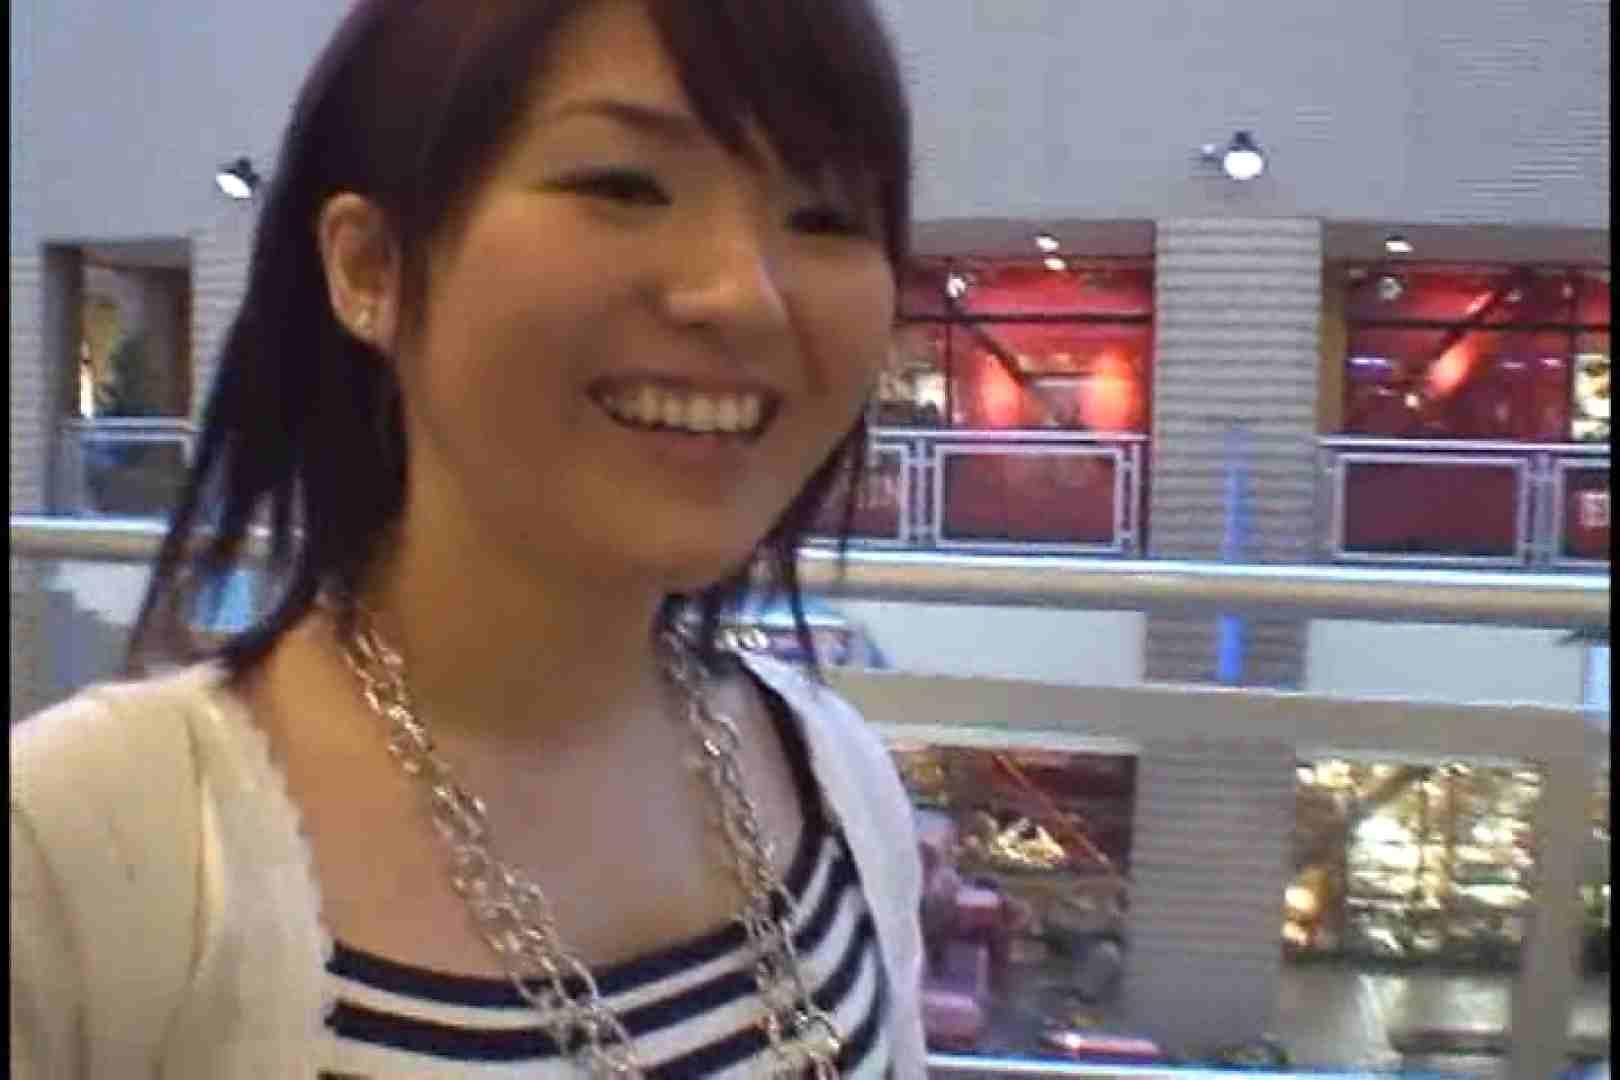 JDハンター全国ツアー vol.002 前編 女子大生のエロ動画 | 0  77PIX 37